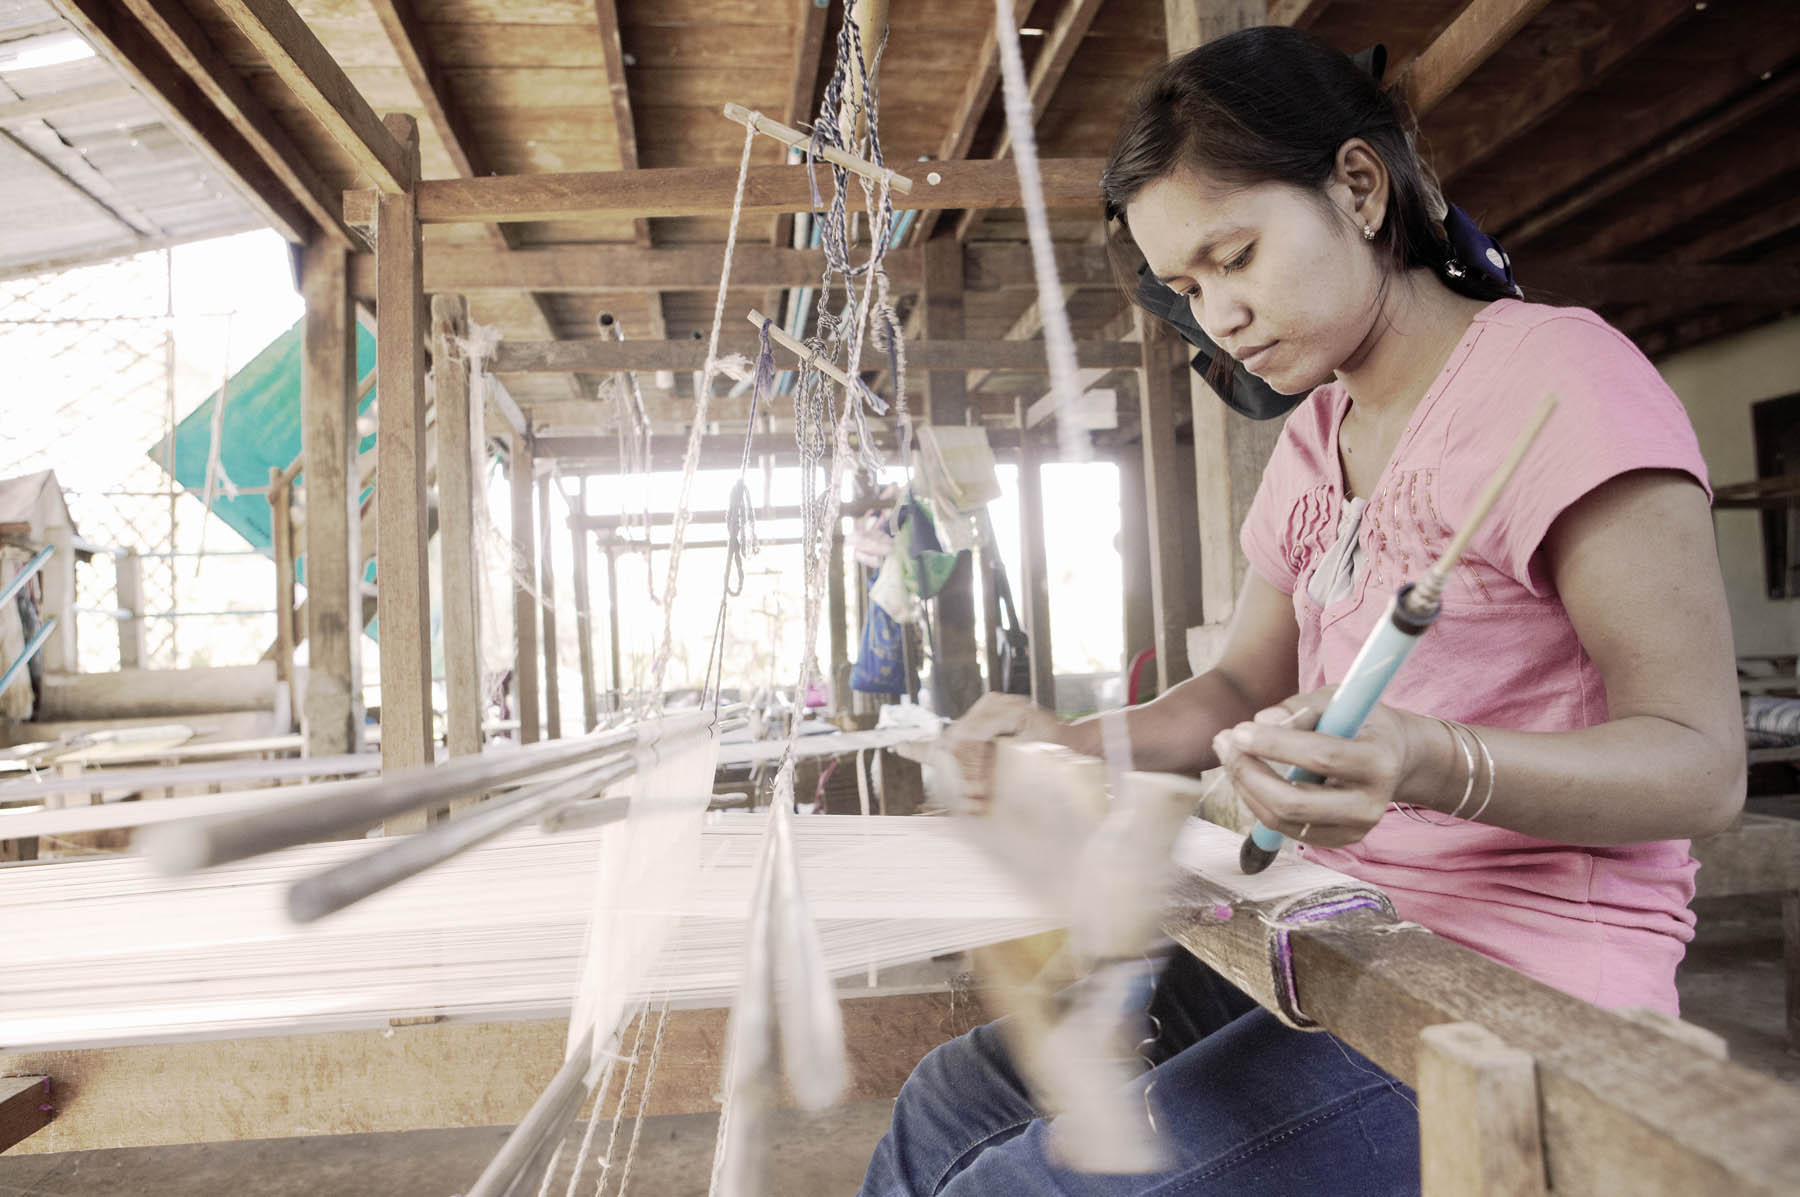 People_of Cambodia_2531.jpg